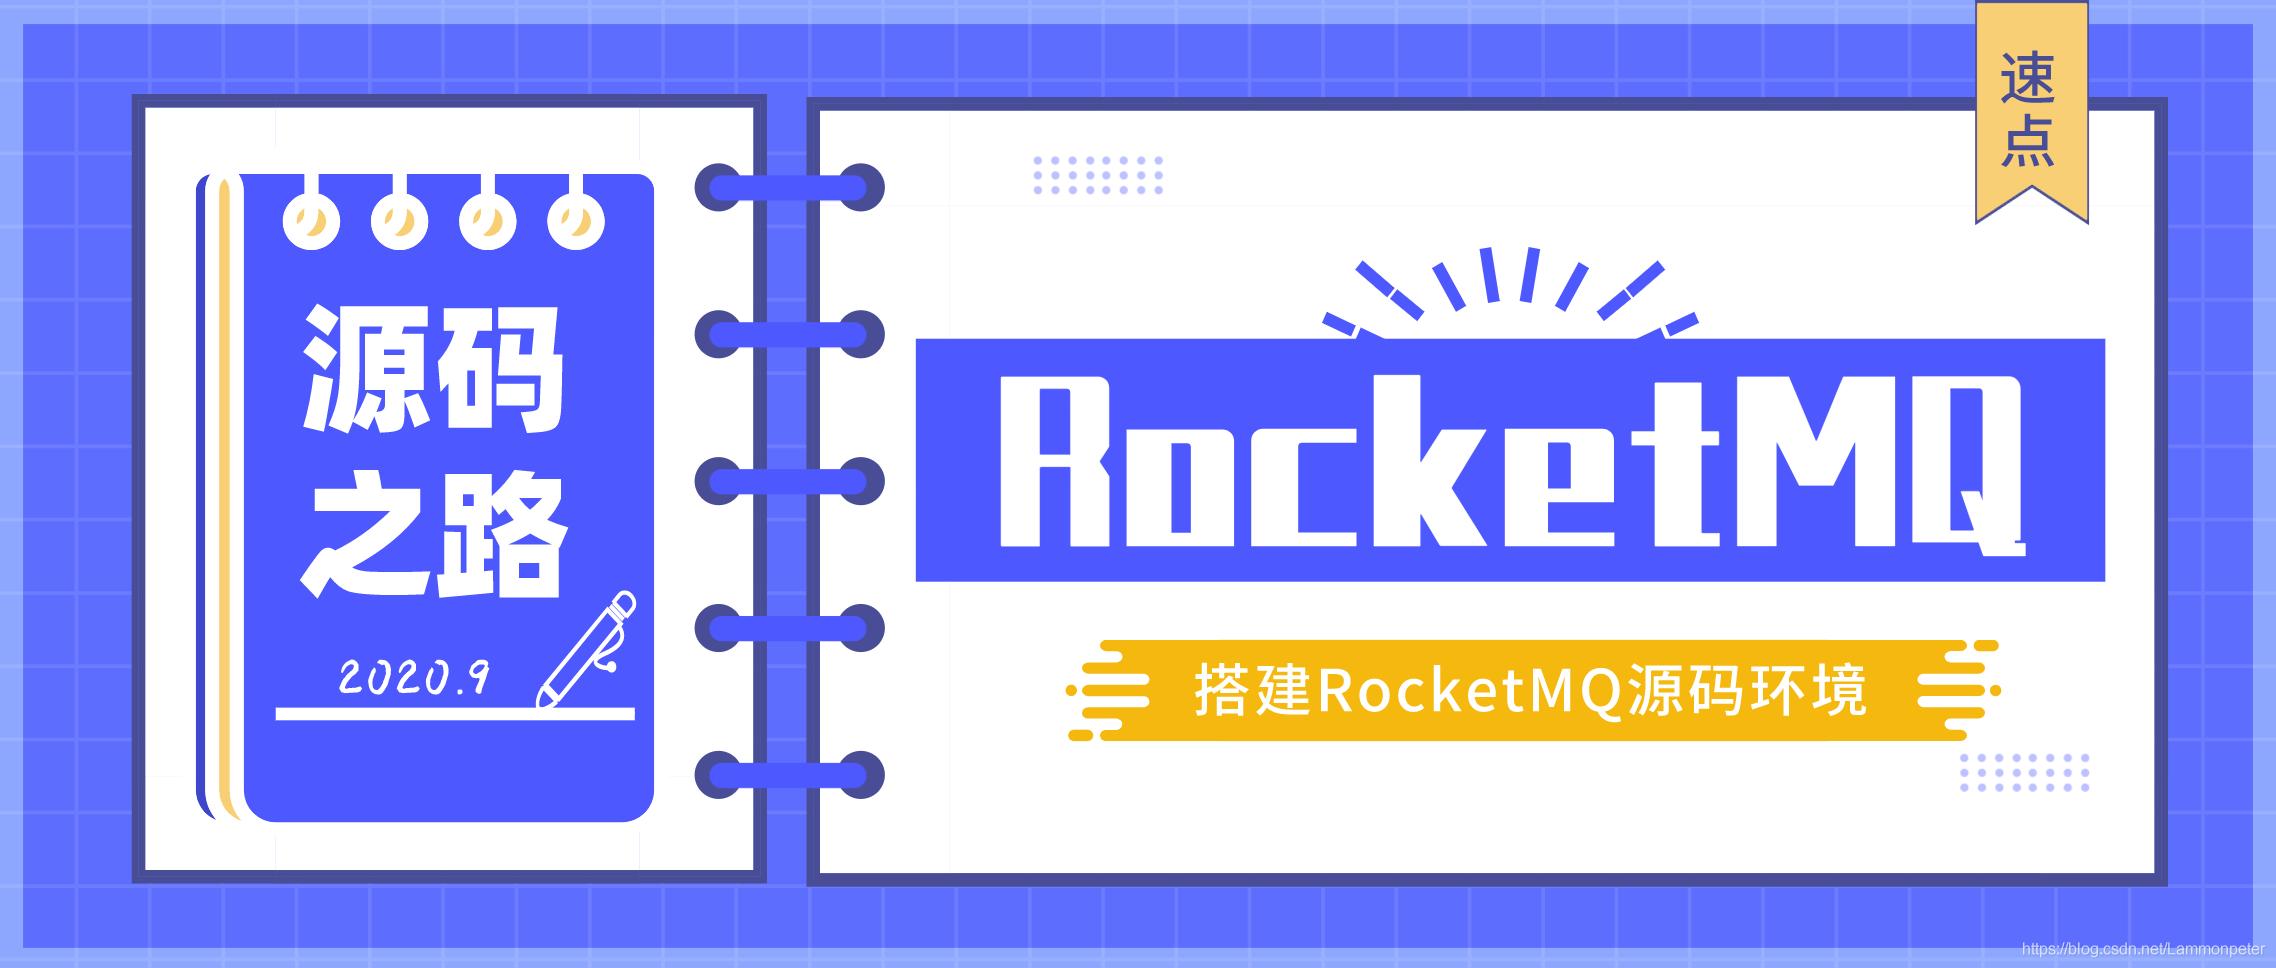 RocketMQ首图